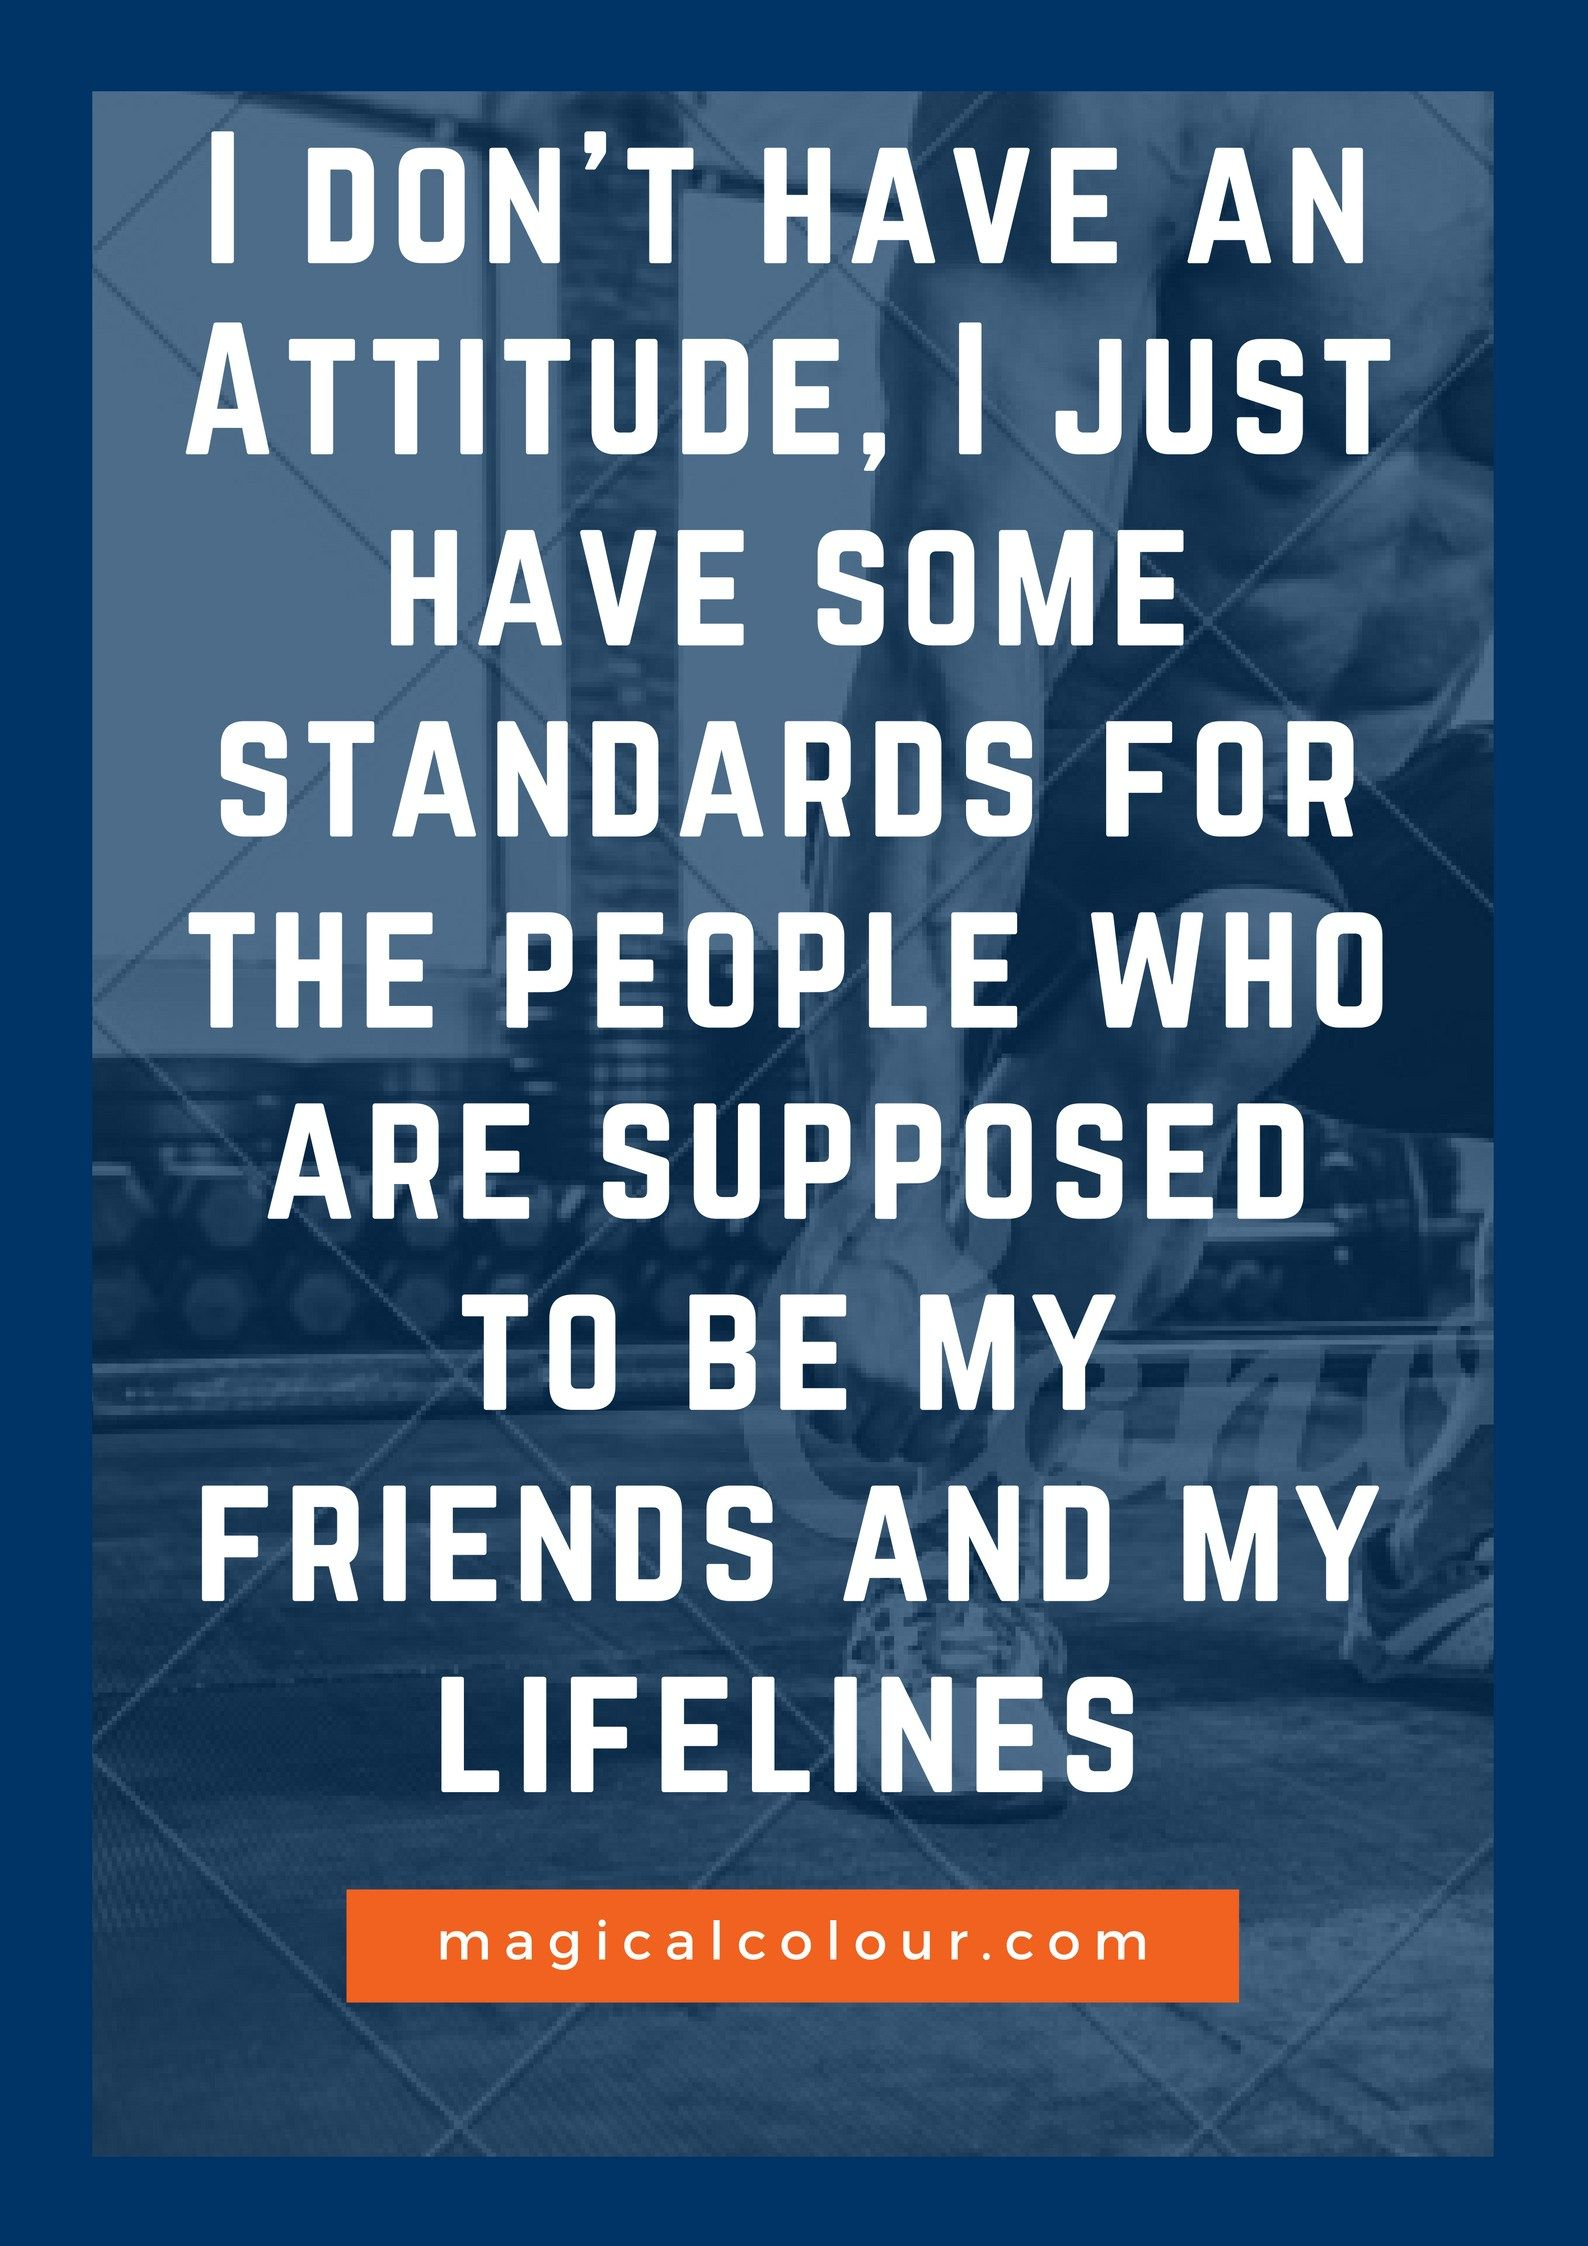 30 Best Attitude Whatsapp Status Attitude Status For Whatsapp Attitude Quoteoftheday Quotes Quotestolive Attitude Status Good Attitude Quotes To Live By